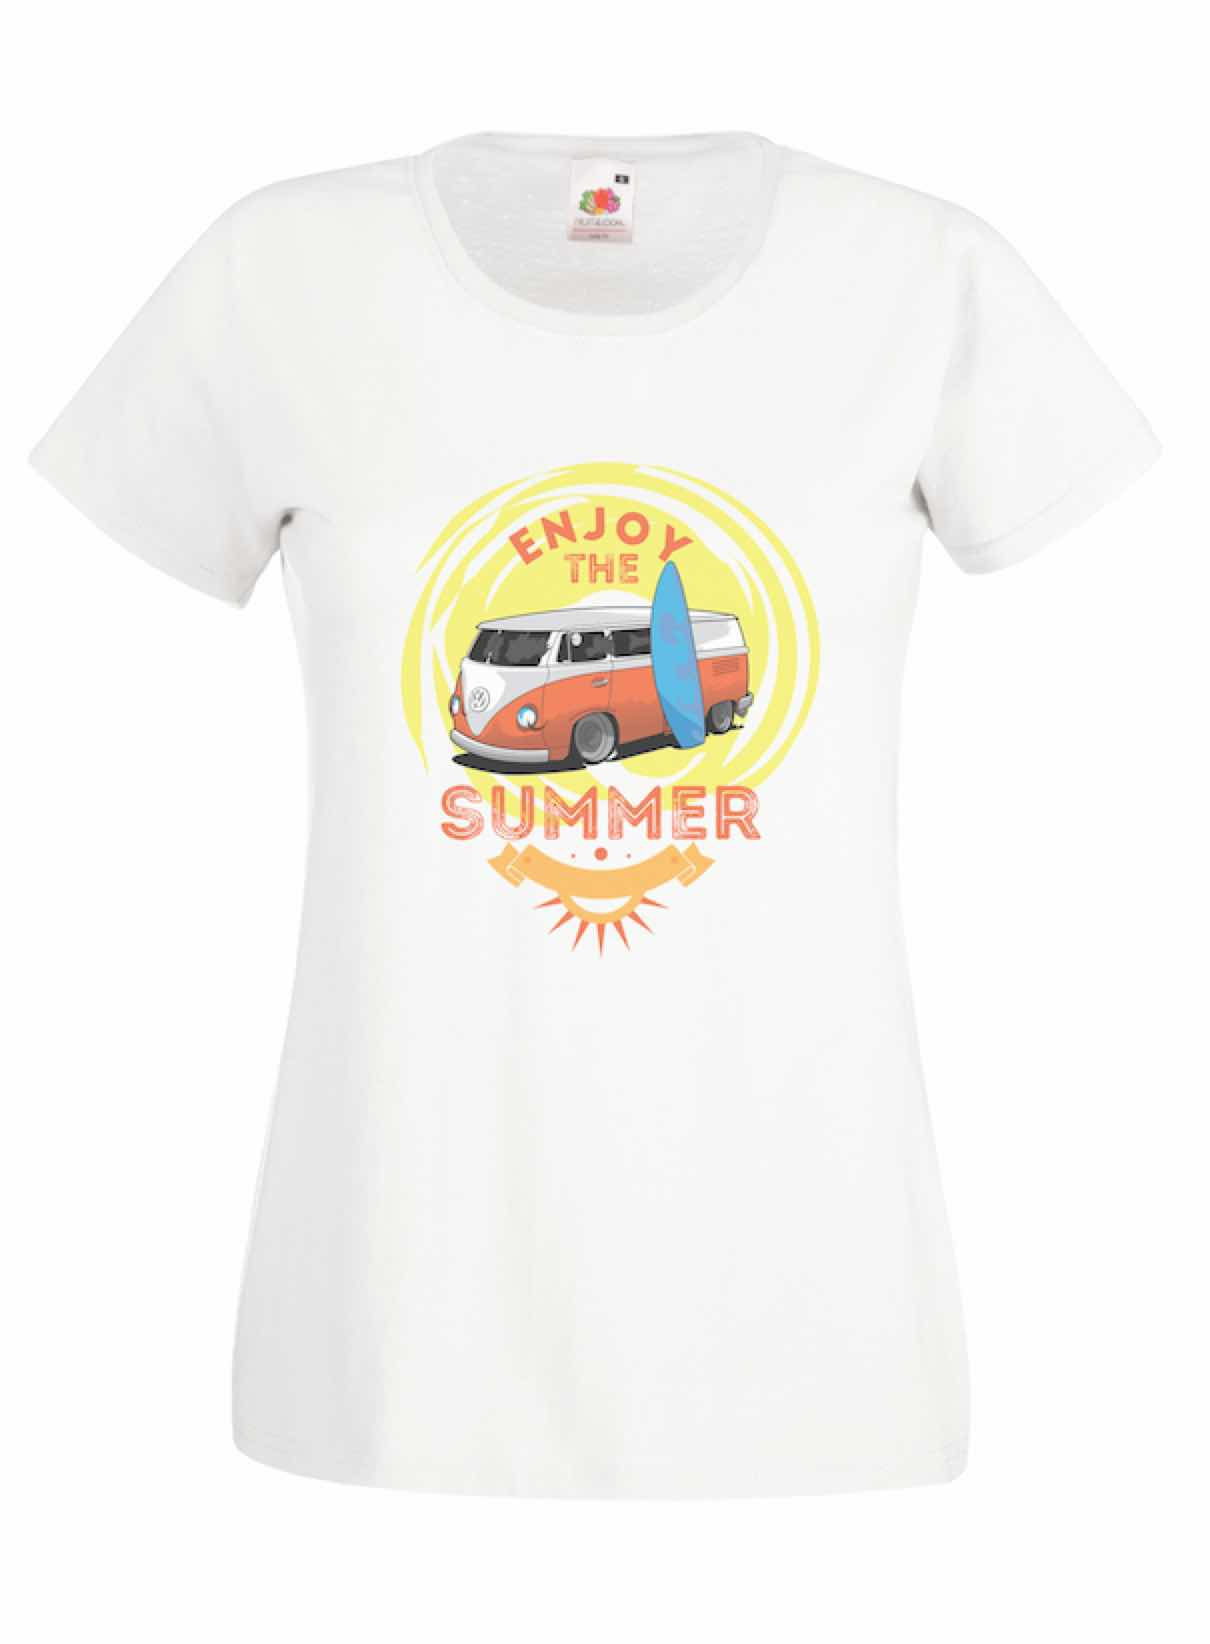 Camper design for t-shirt, hoodie & sweatshirt